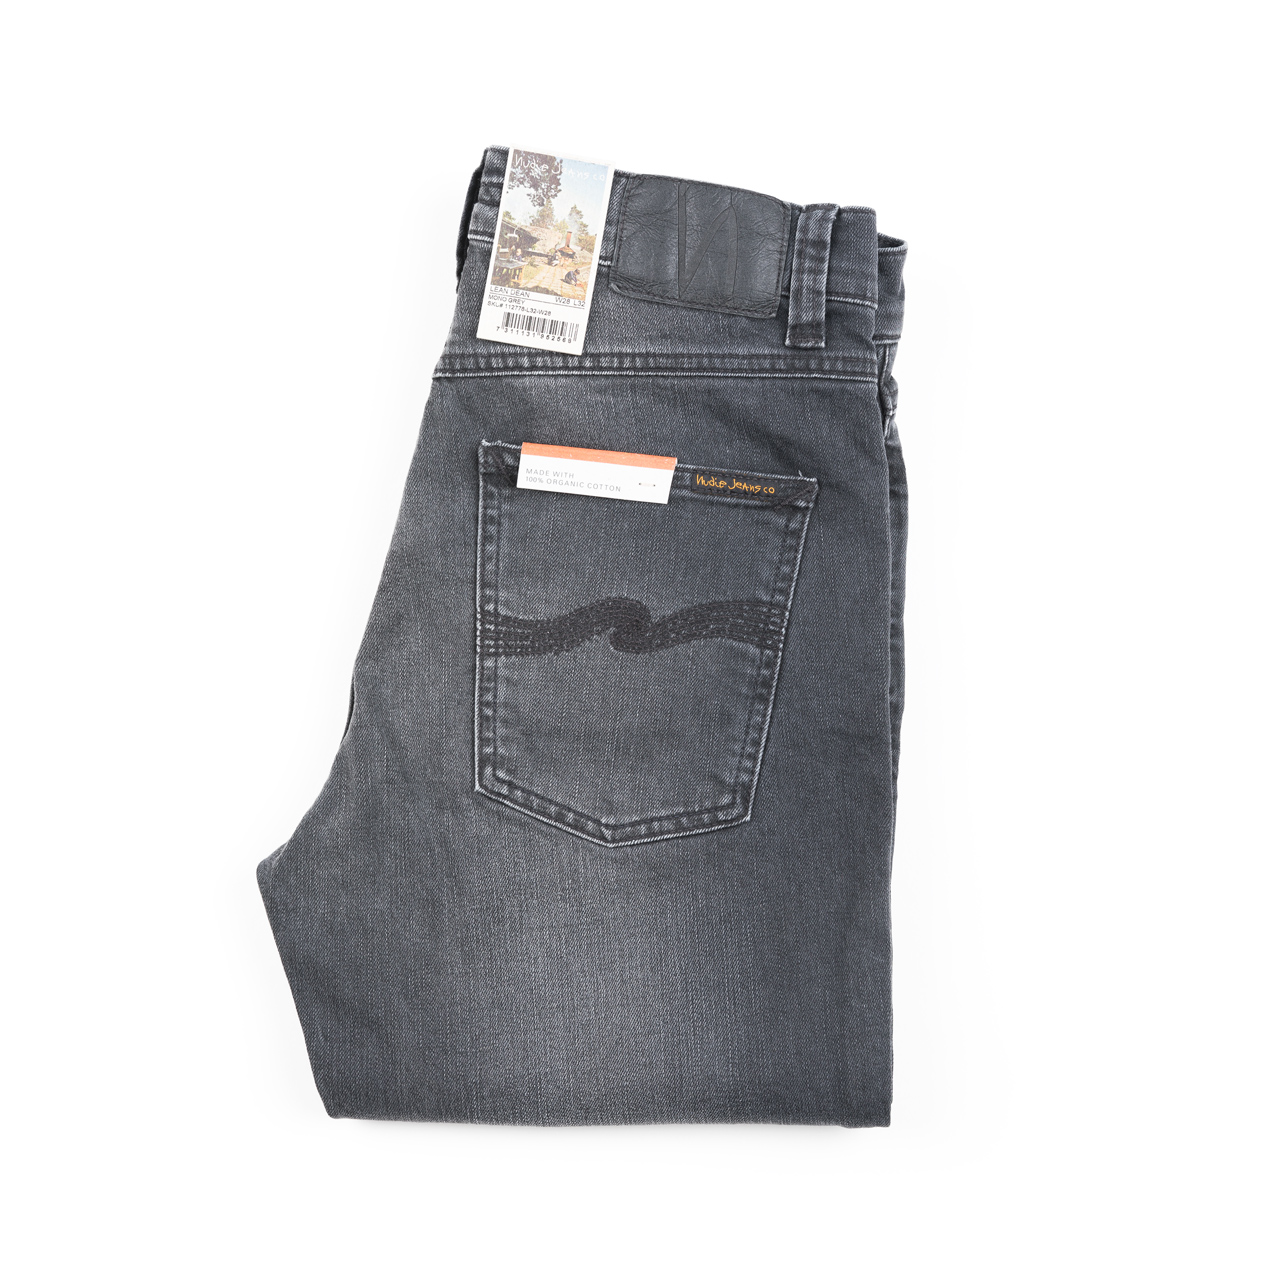 Nudie Jeans - LEAN DEAN - Mono Grey